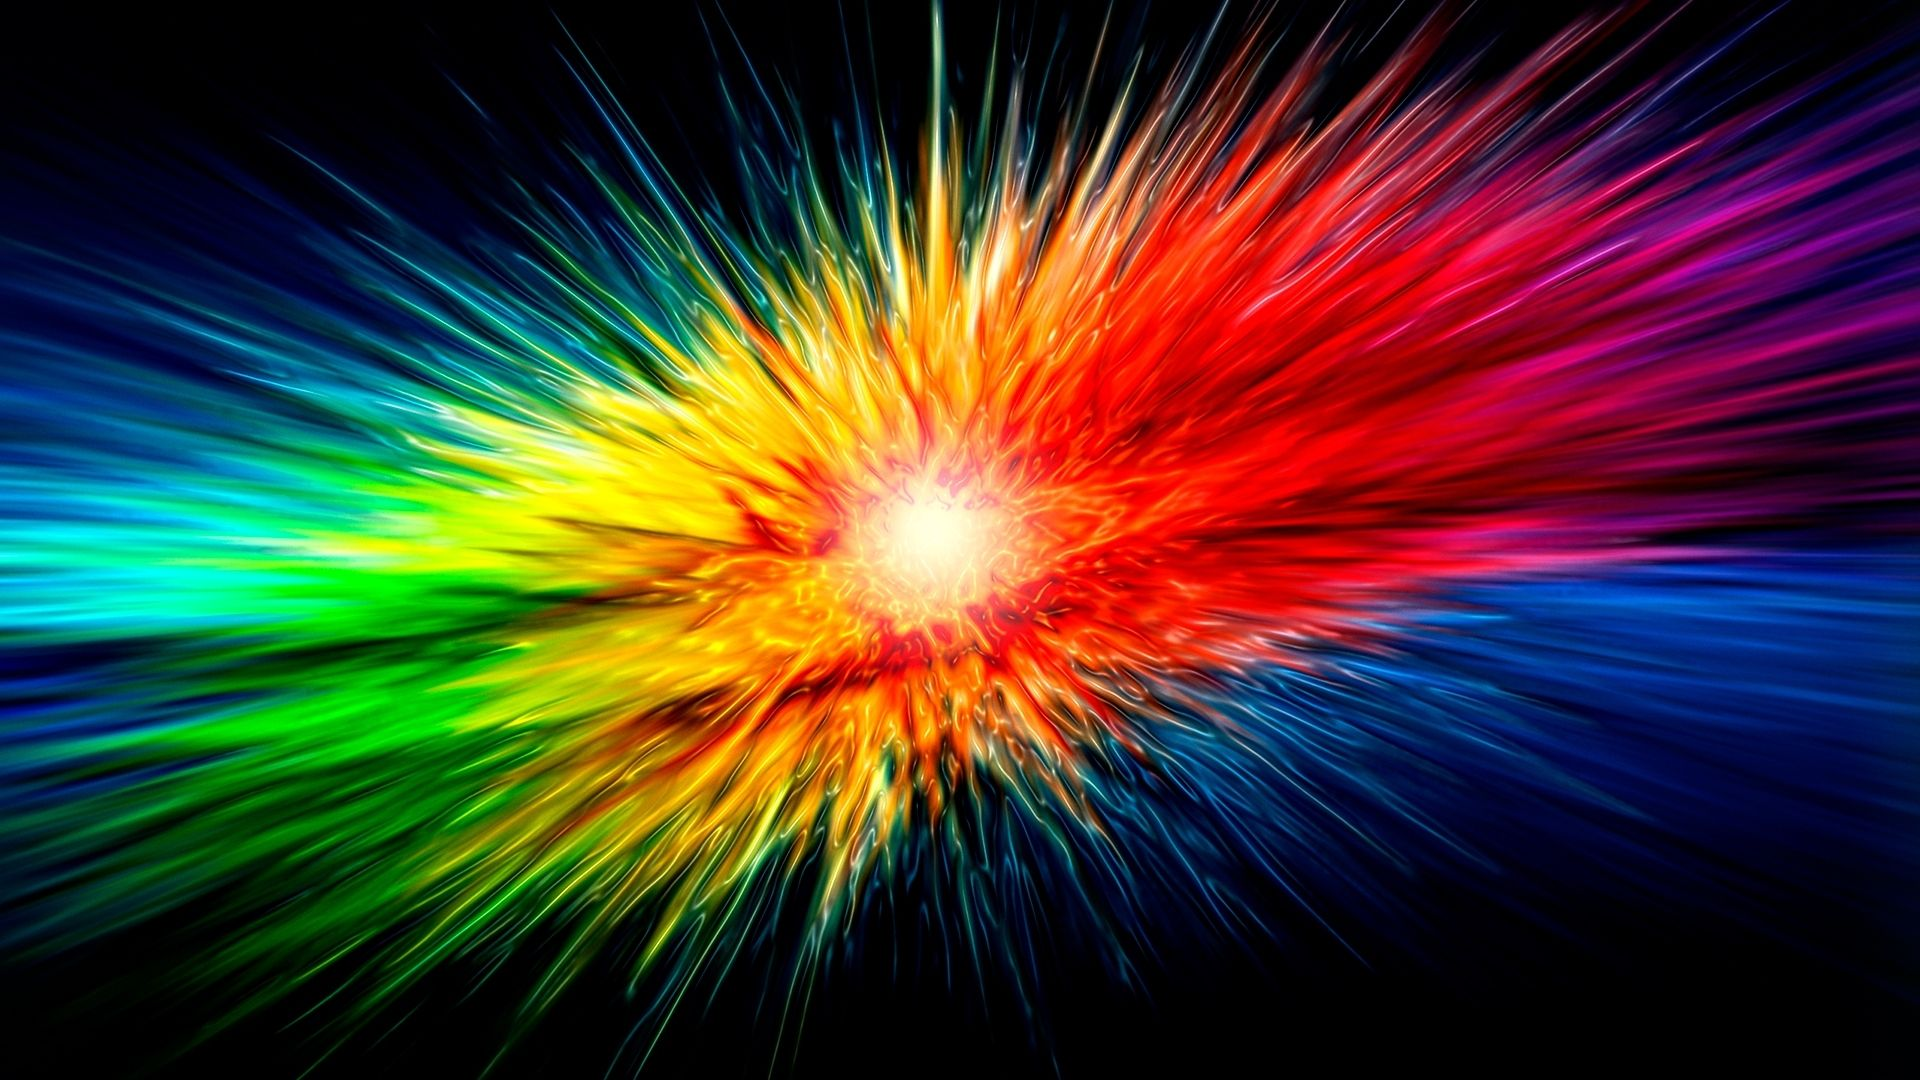 HD Wallpapers Widescreen 1080P 3D | ... Size | More color boom 1080p hd wallpaper 1920x… | Cool ...